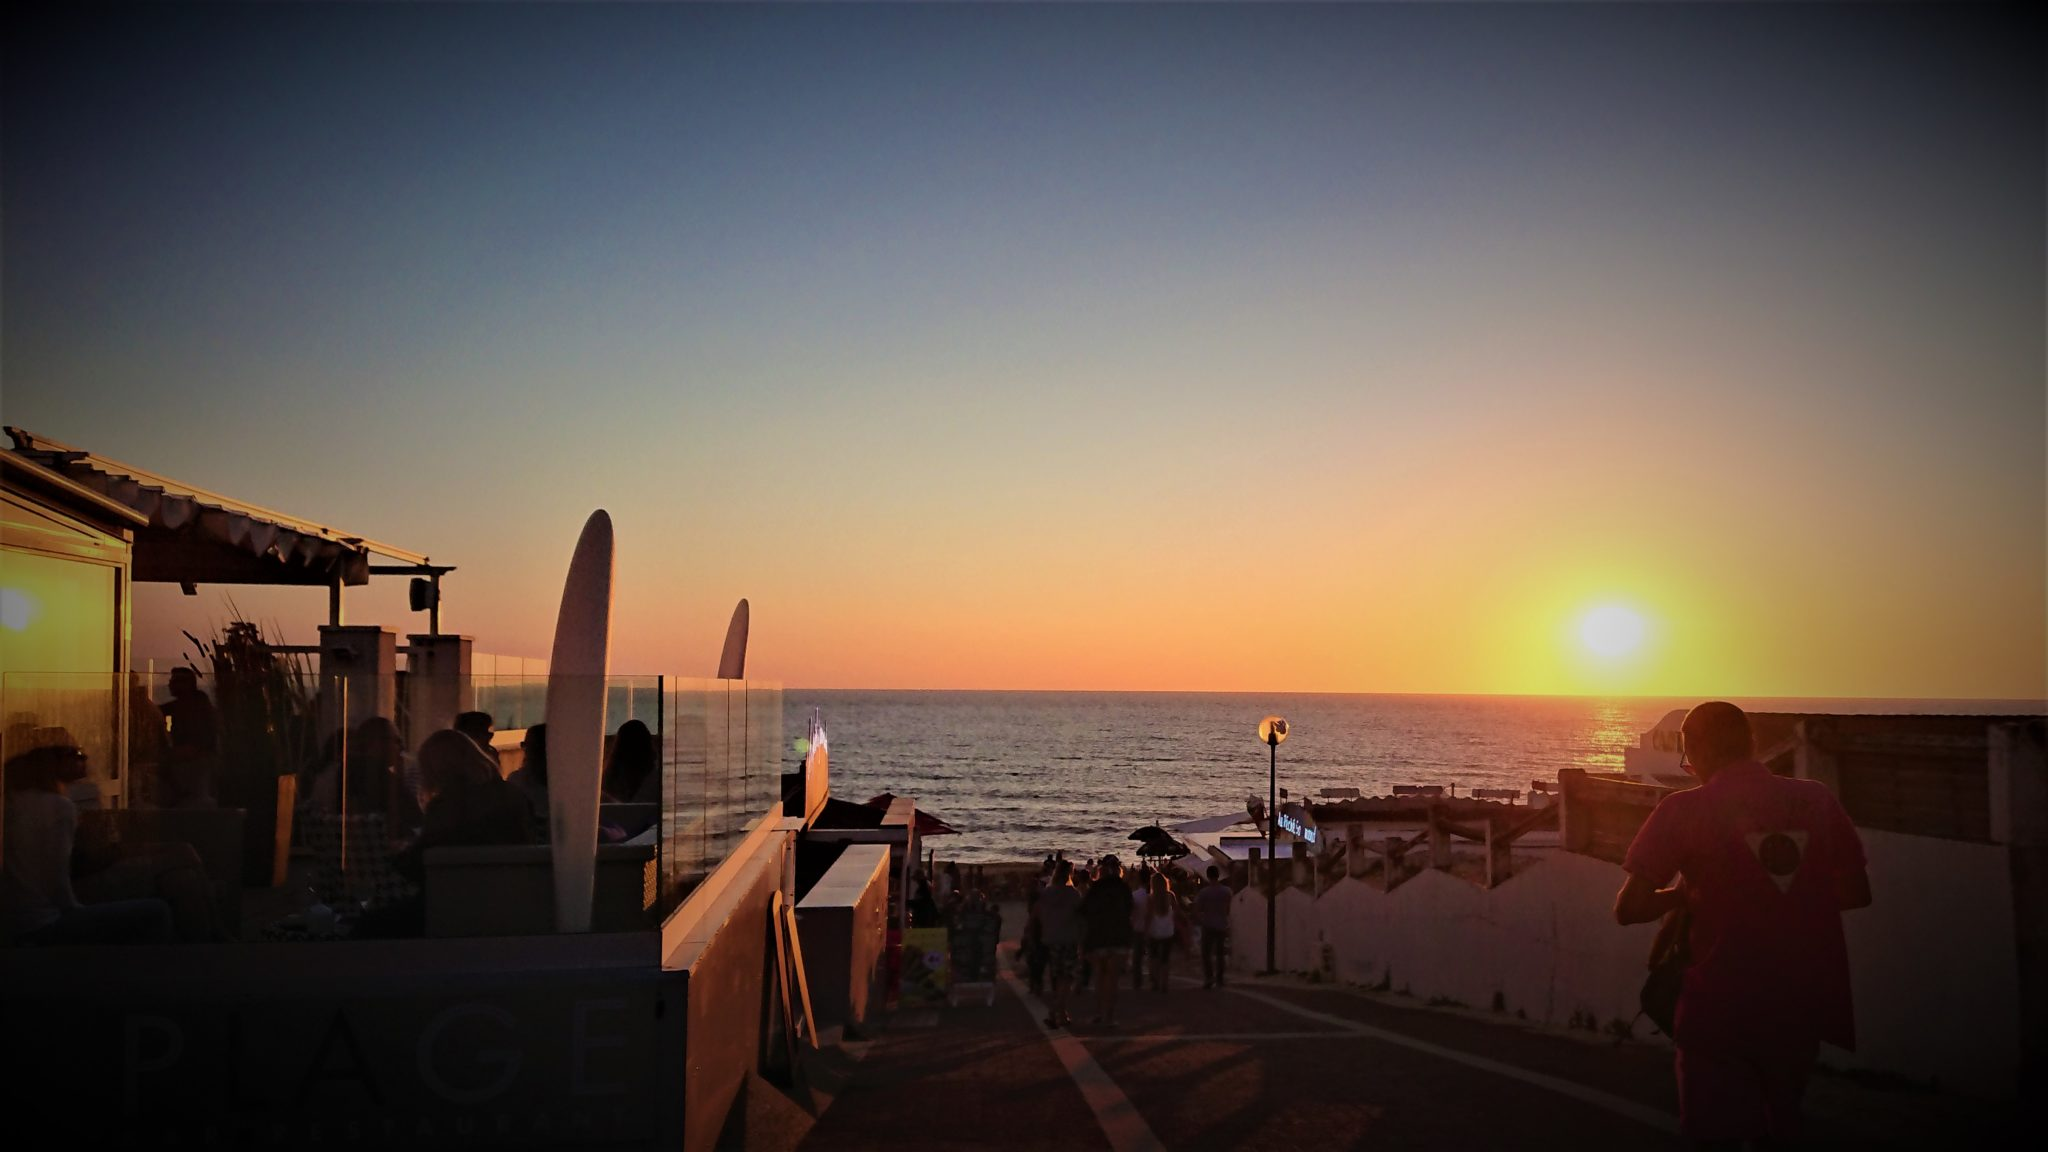 Sunset-Vieux-Boucau